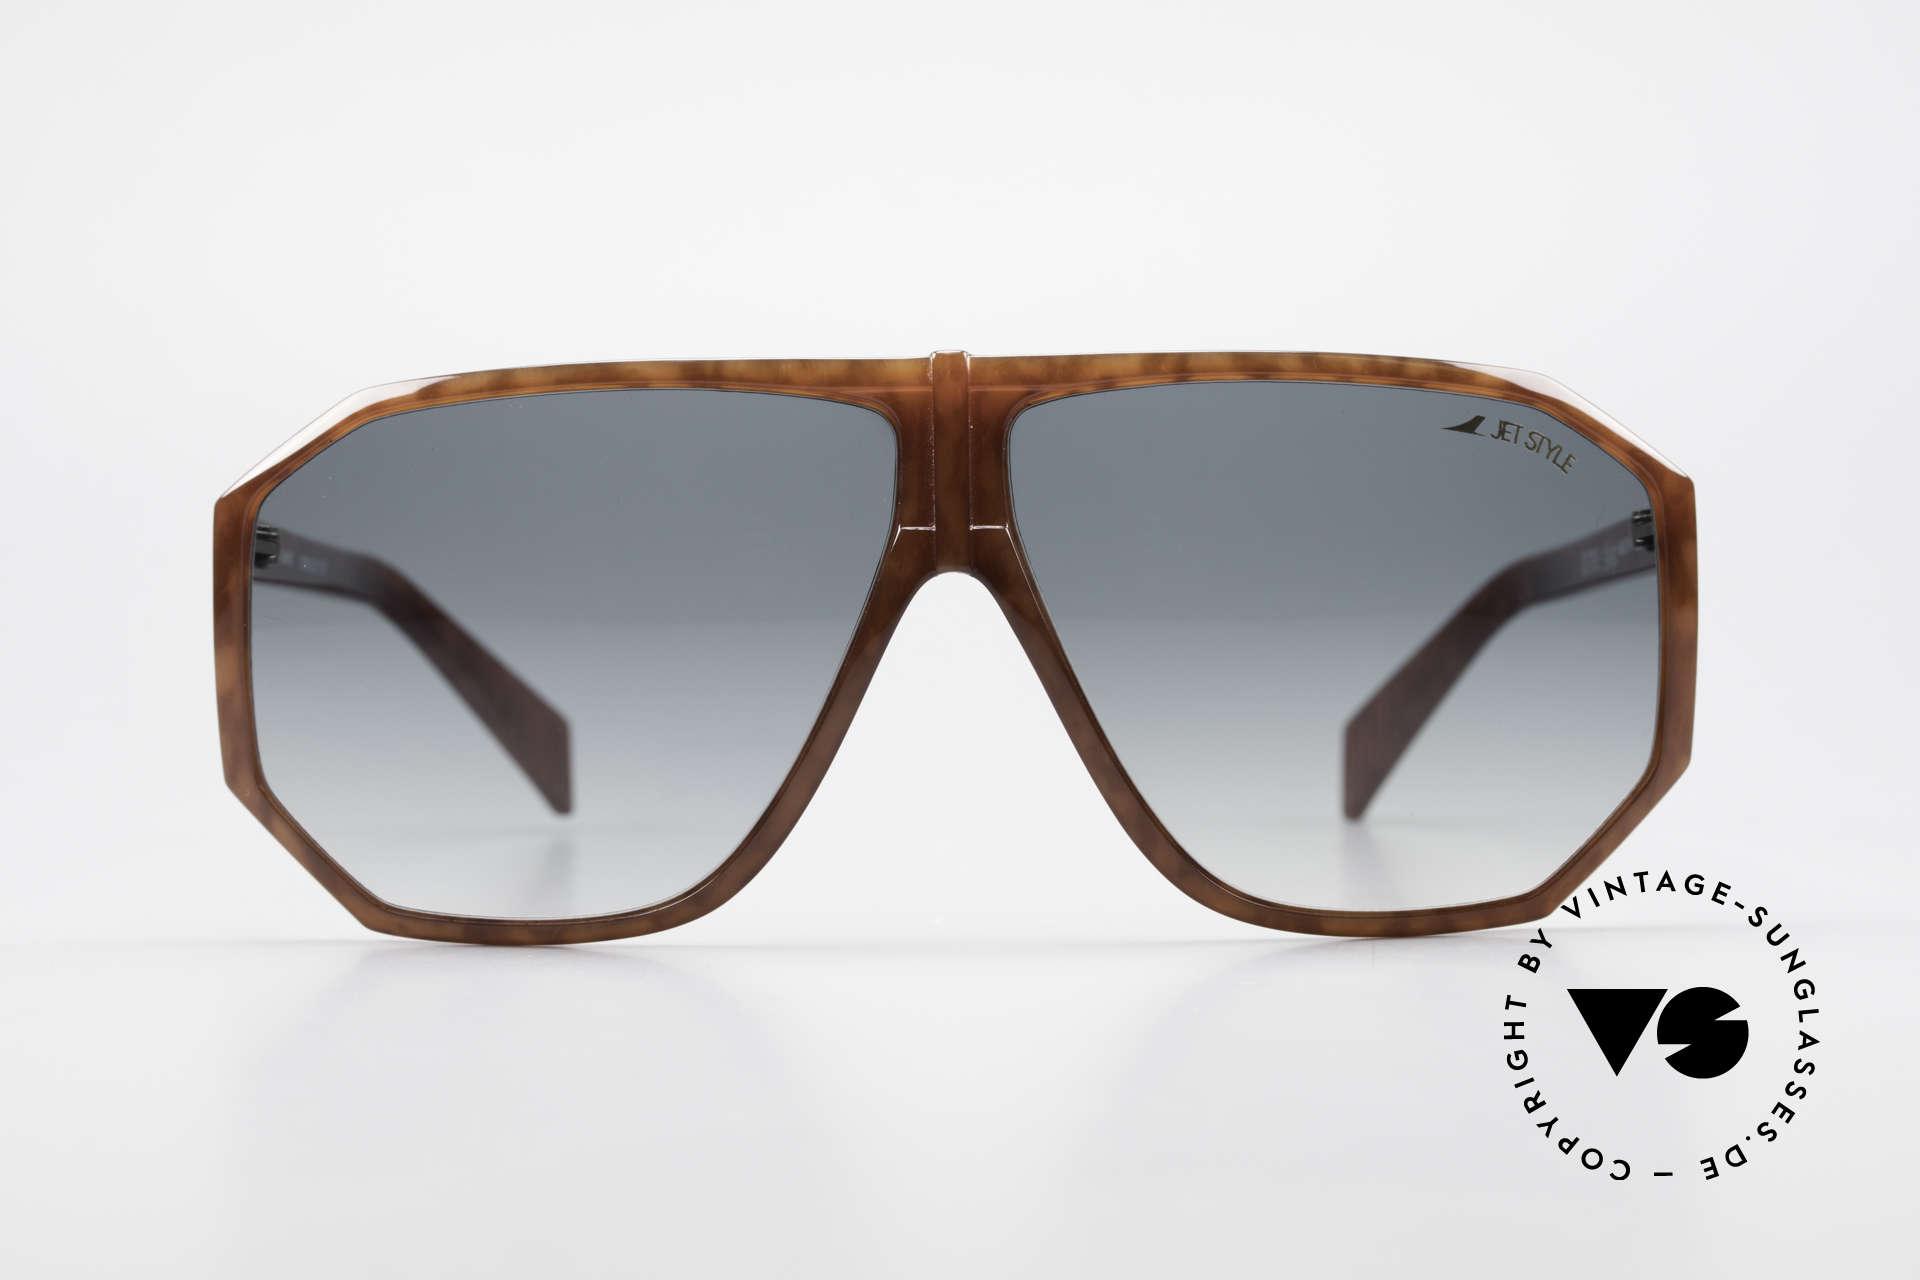 Silhouette M4019 JetStyle Aviator Sunglasses, precious model of the legendary 'JetStyle' series, Made for Men